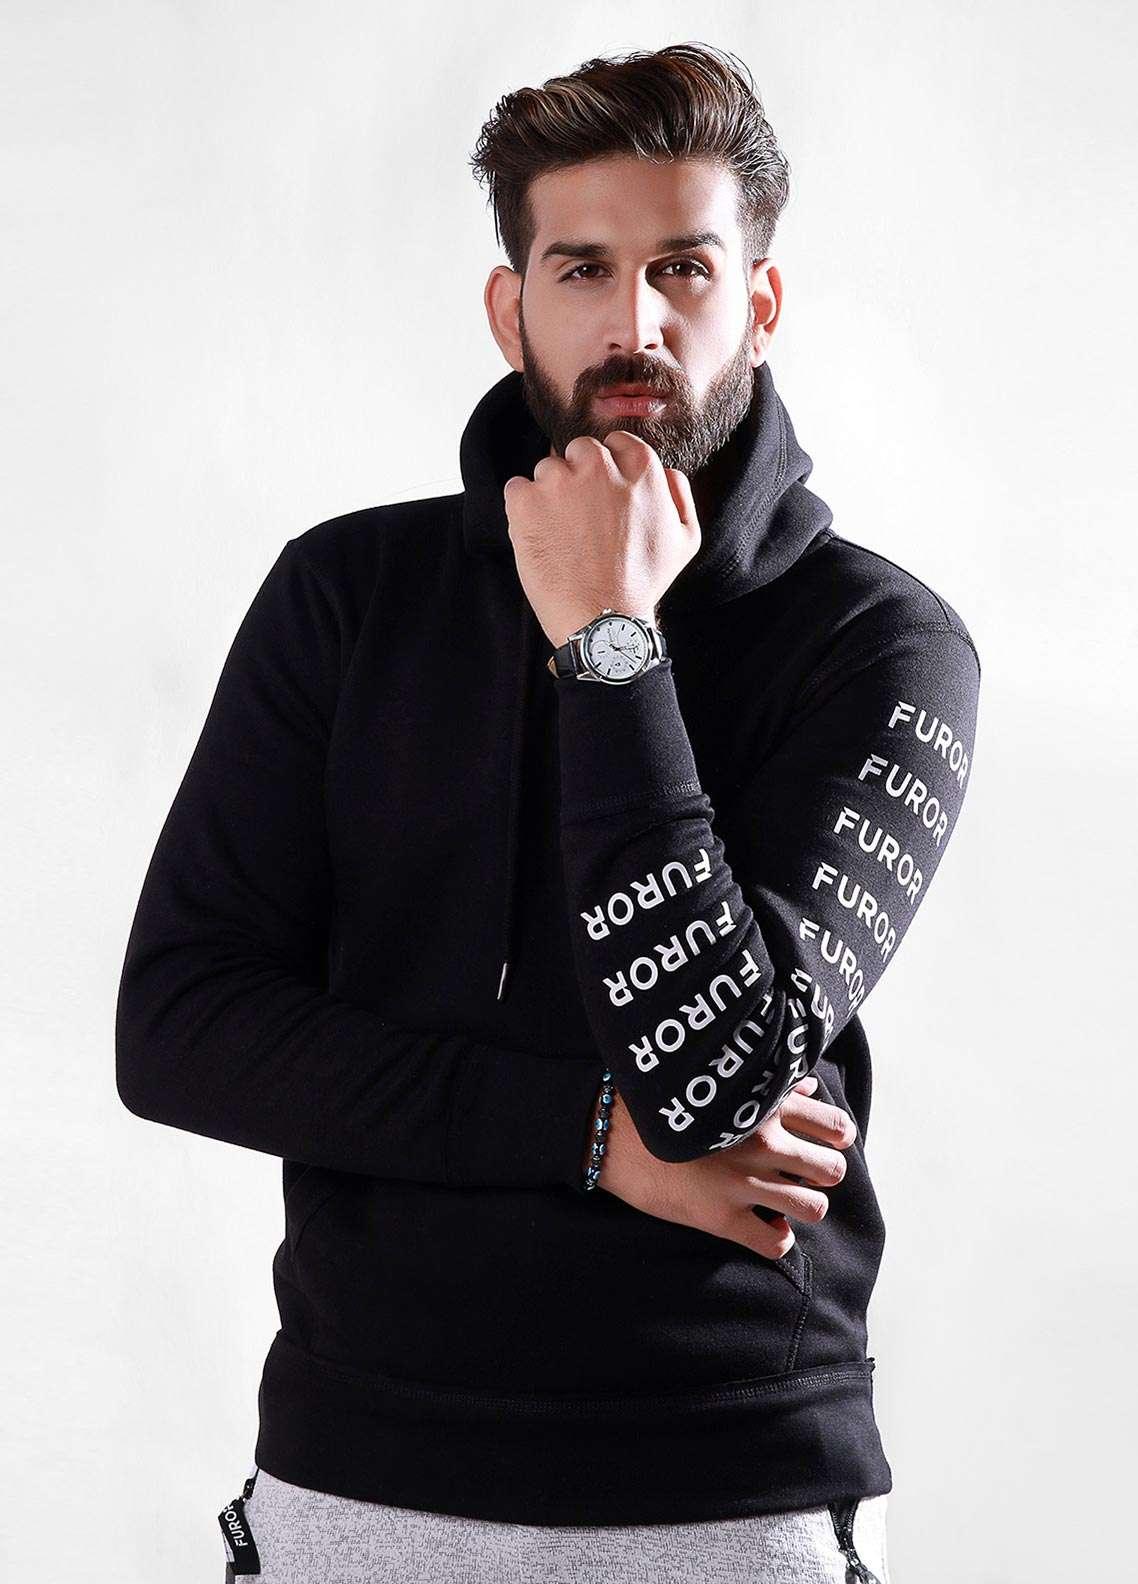 Furor Cotton Winter Hoodies for Men - Black FMTH18-009